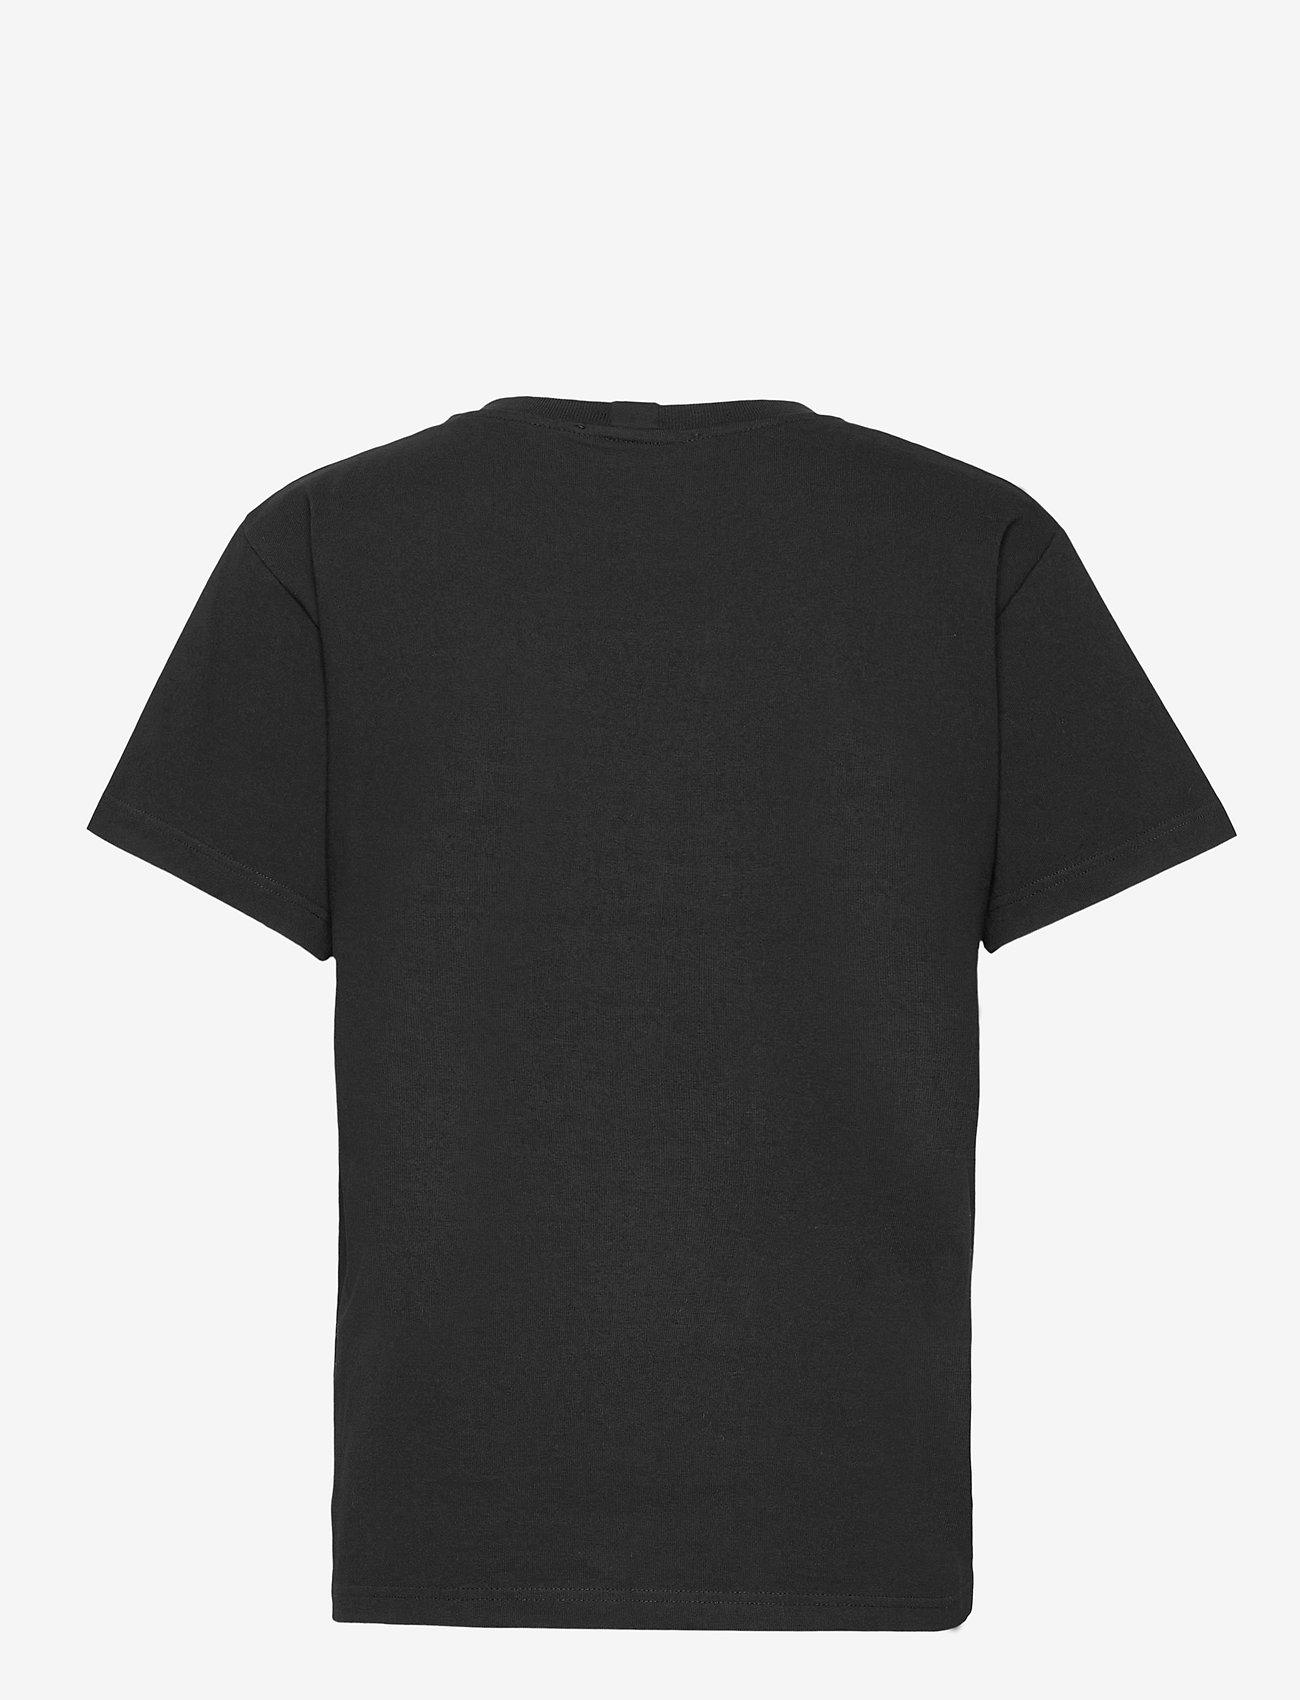 Helmut Lang - CLASSIC LOGO T.HVY C - t-shirts - black - 1